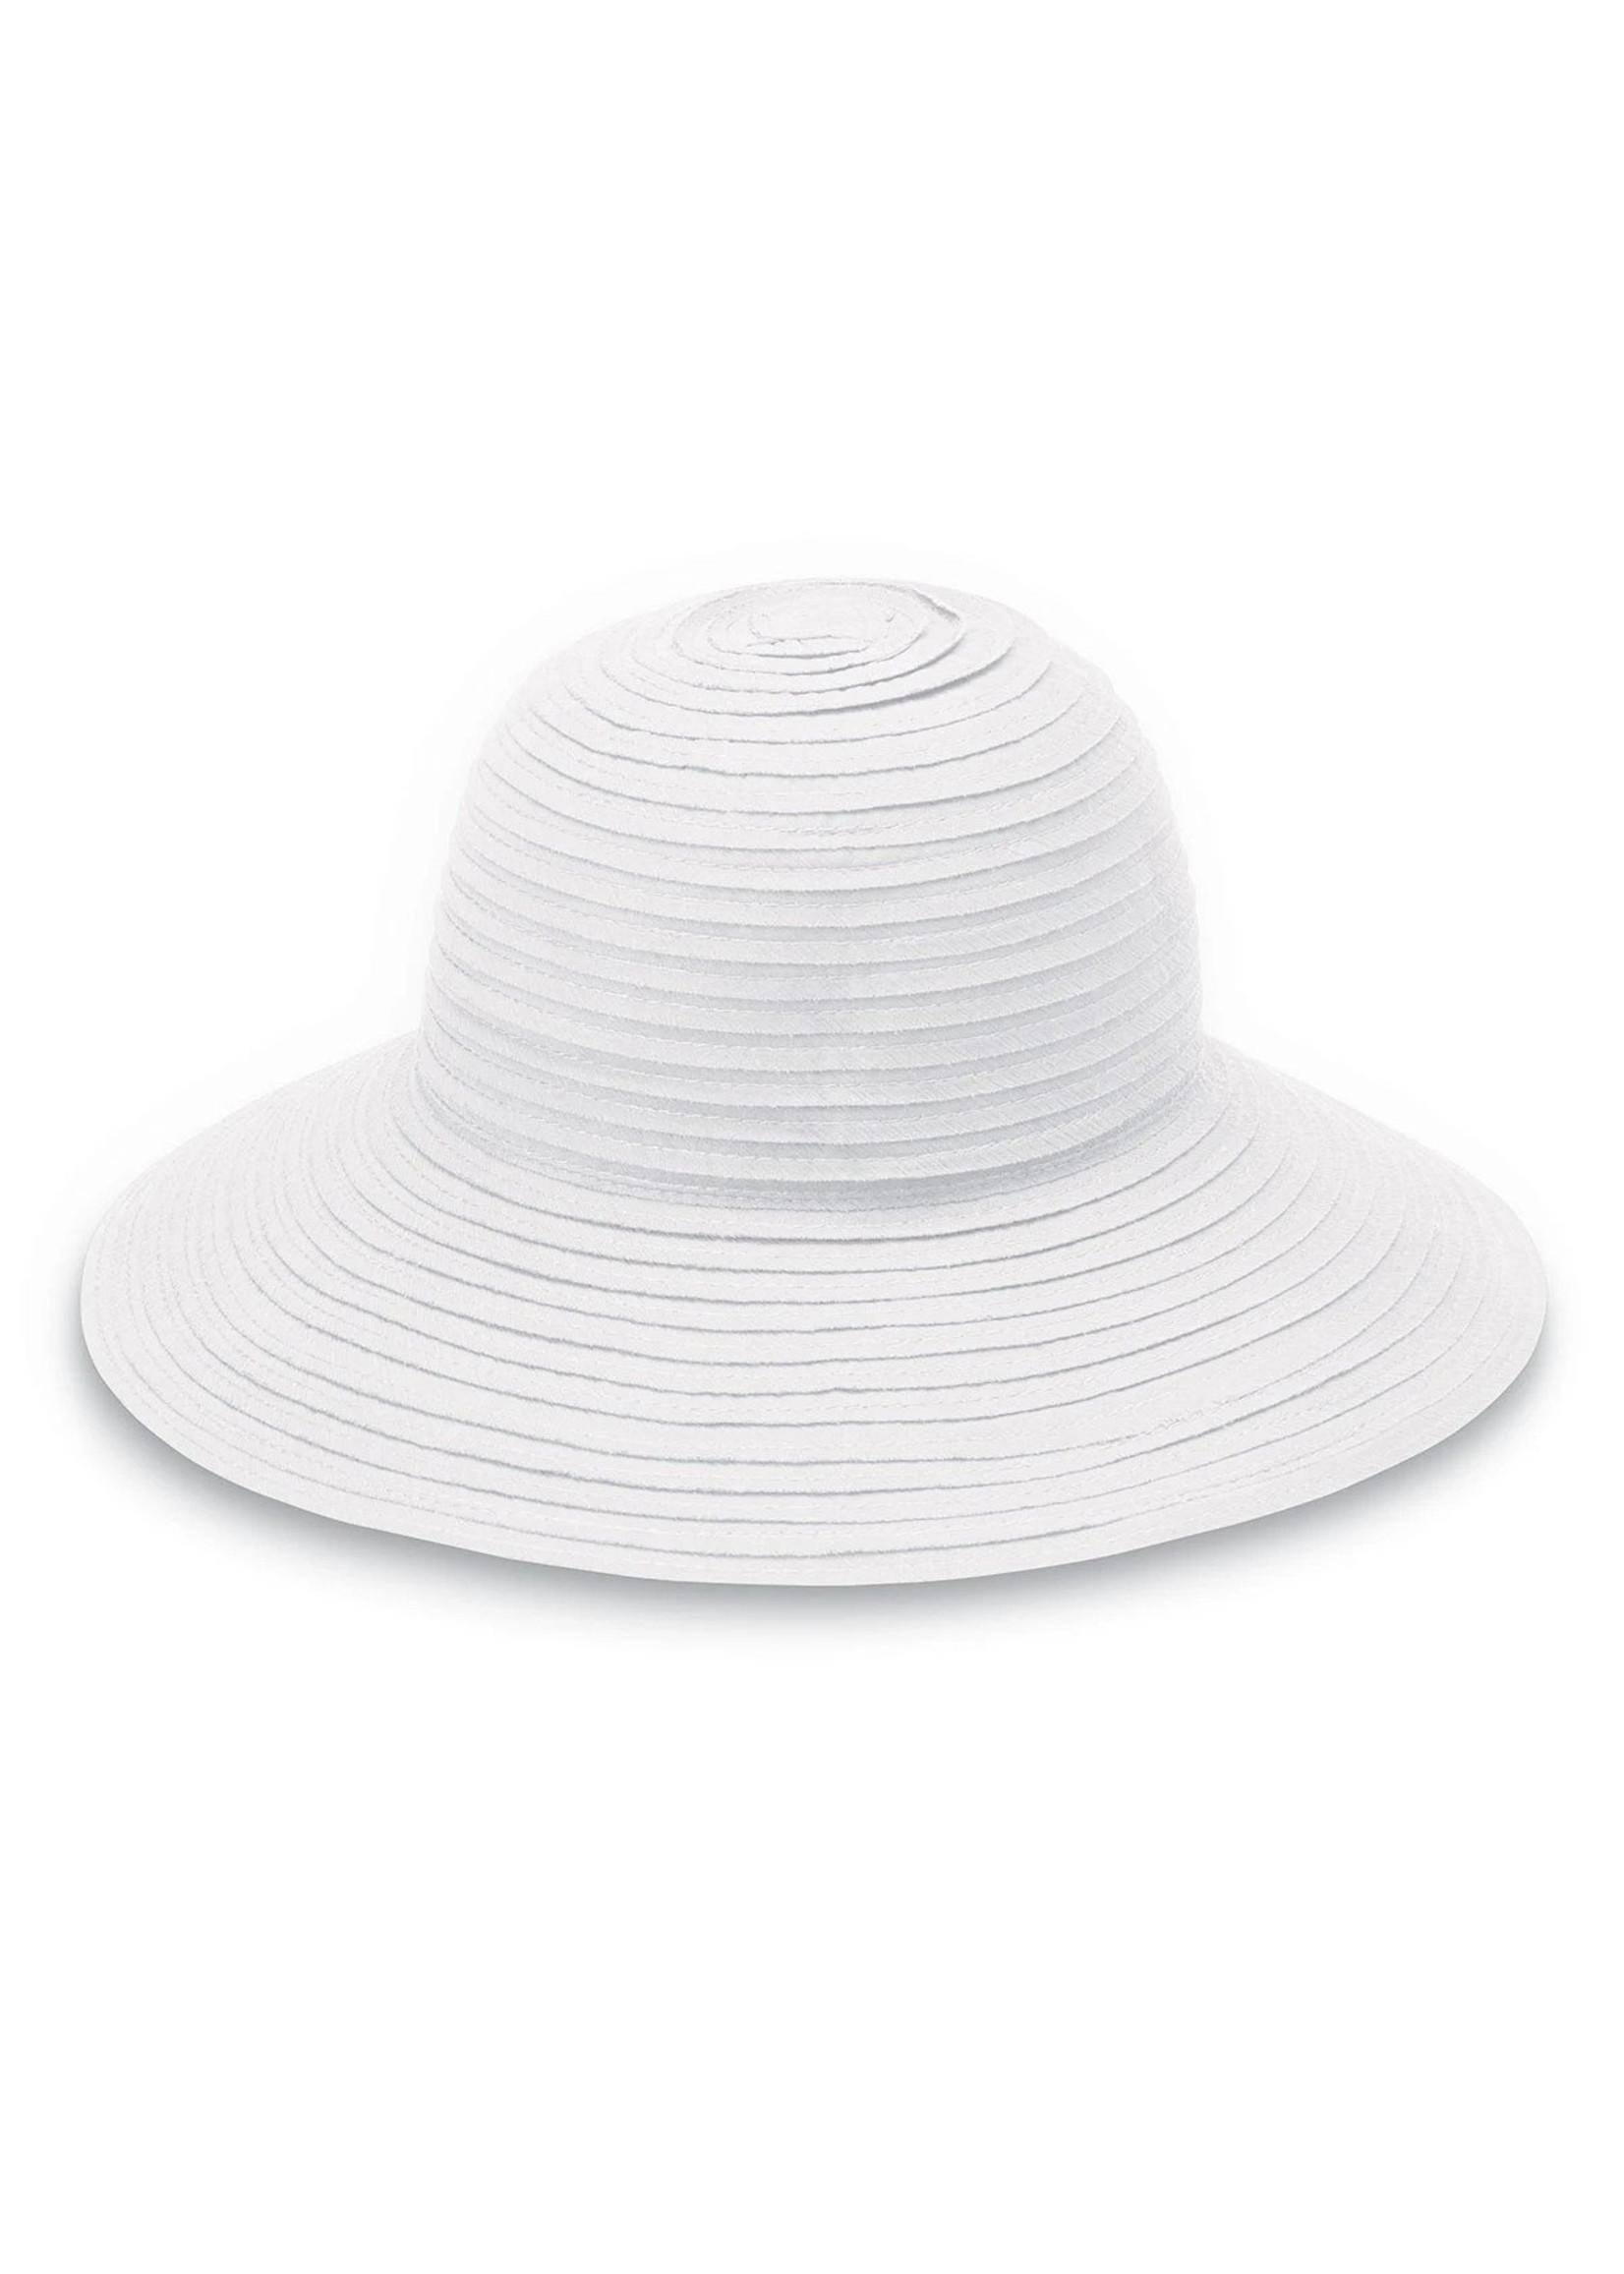 Wallaroo WA Scrunchie Hat